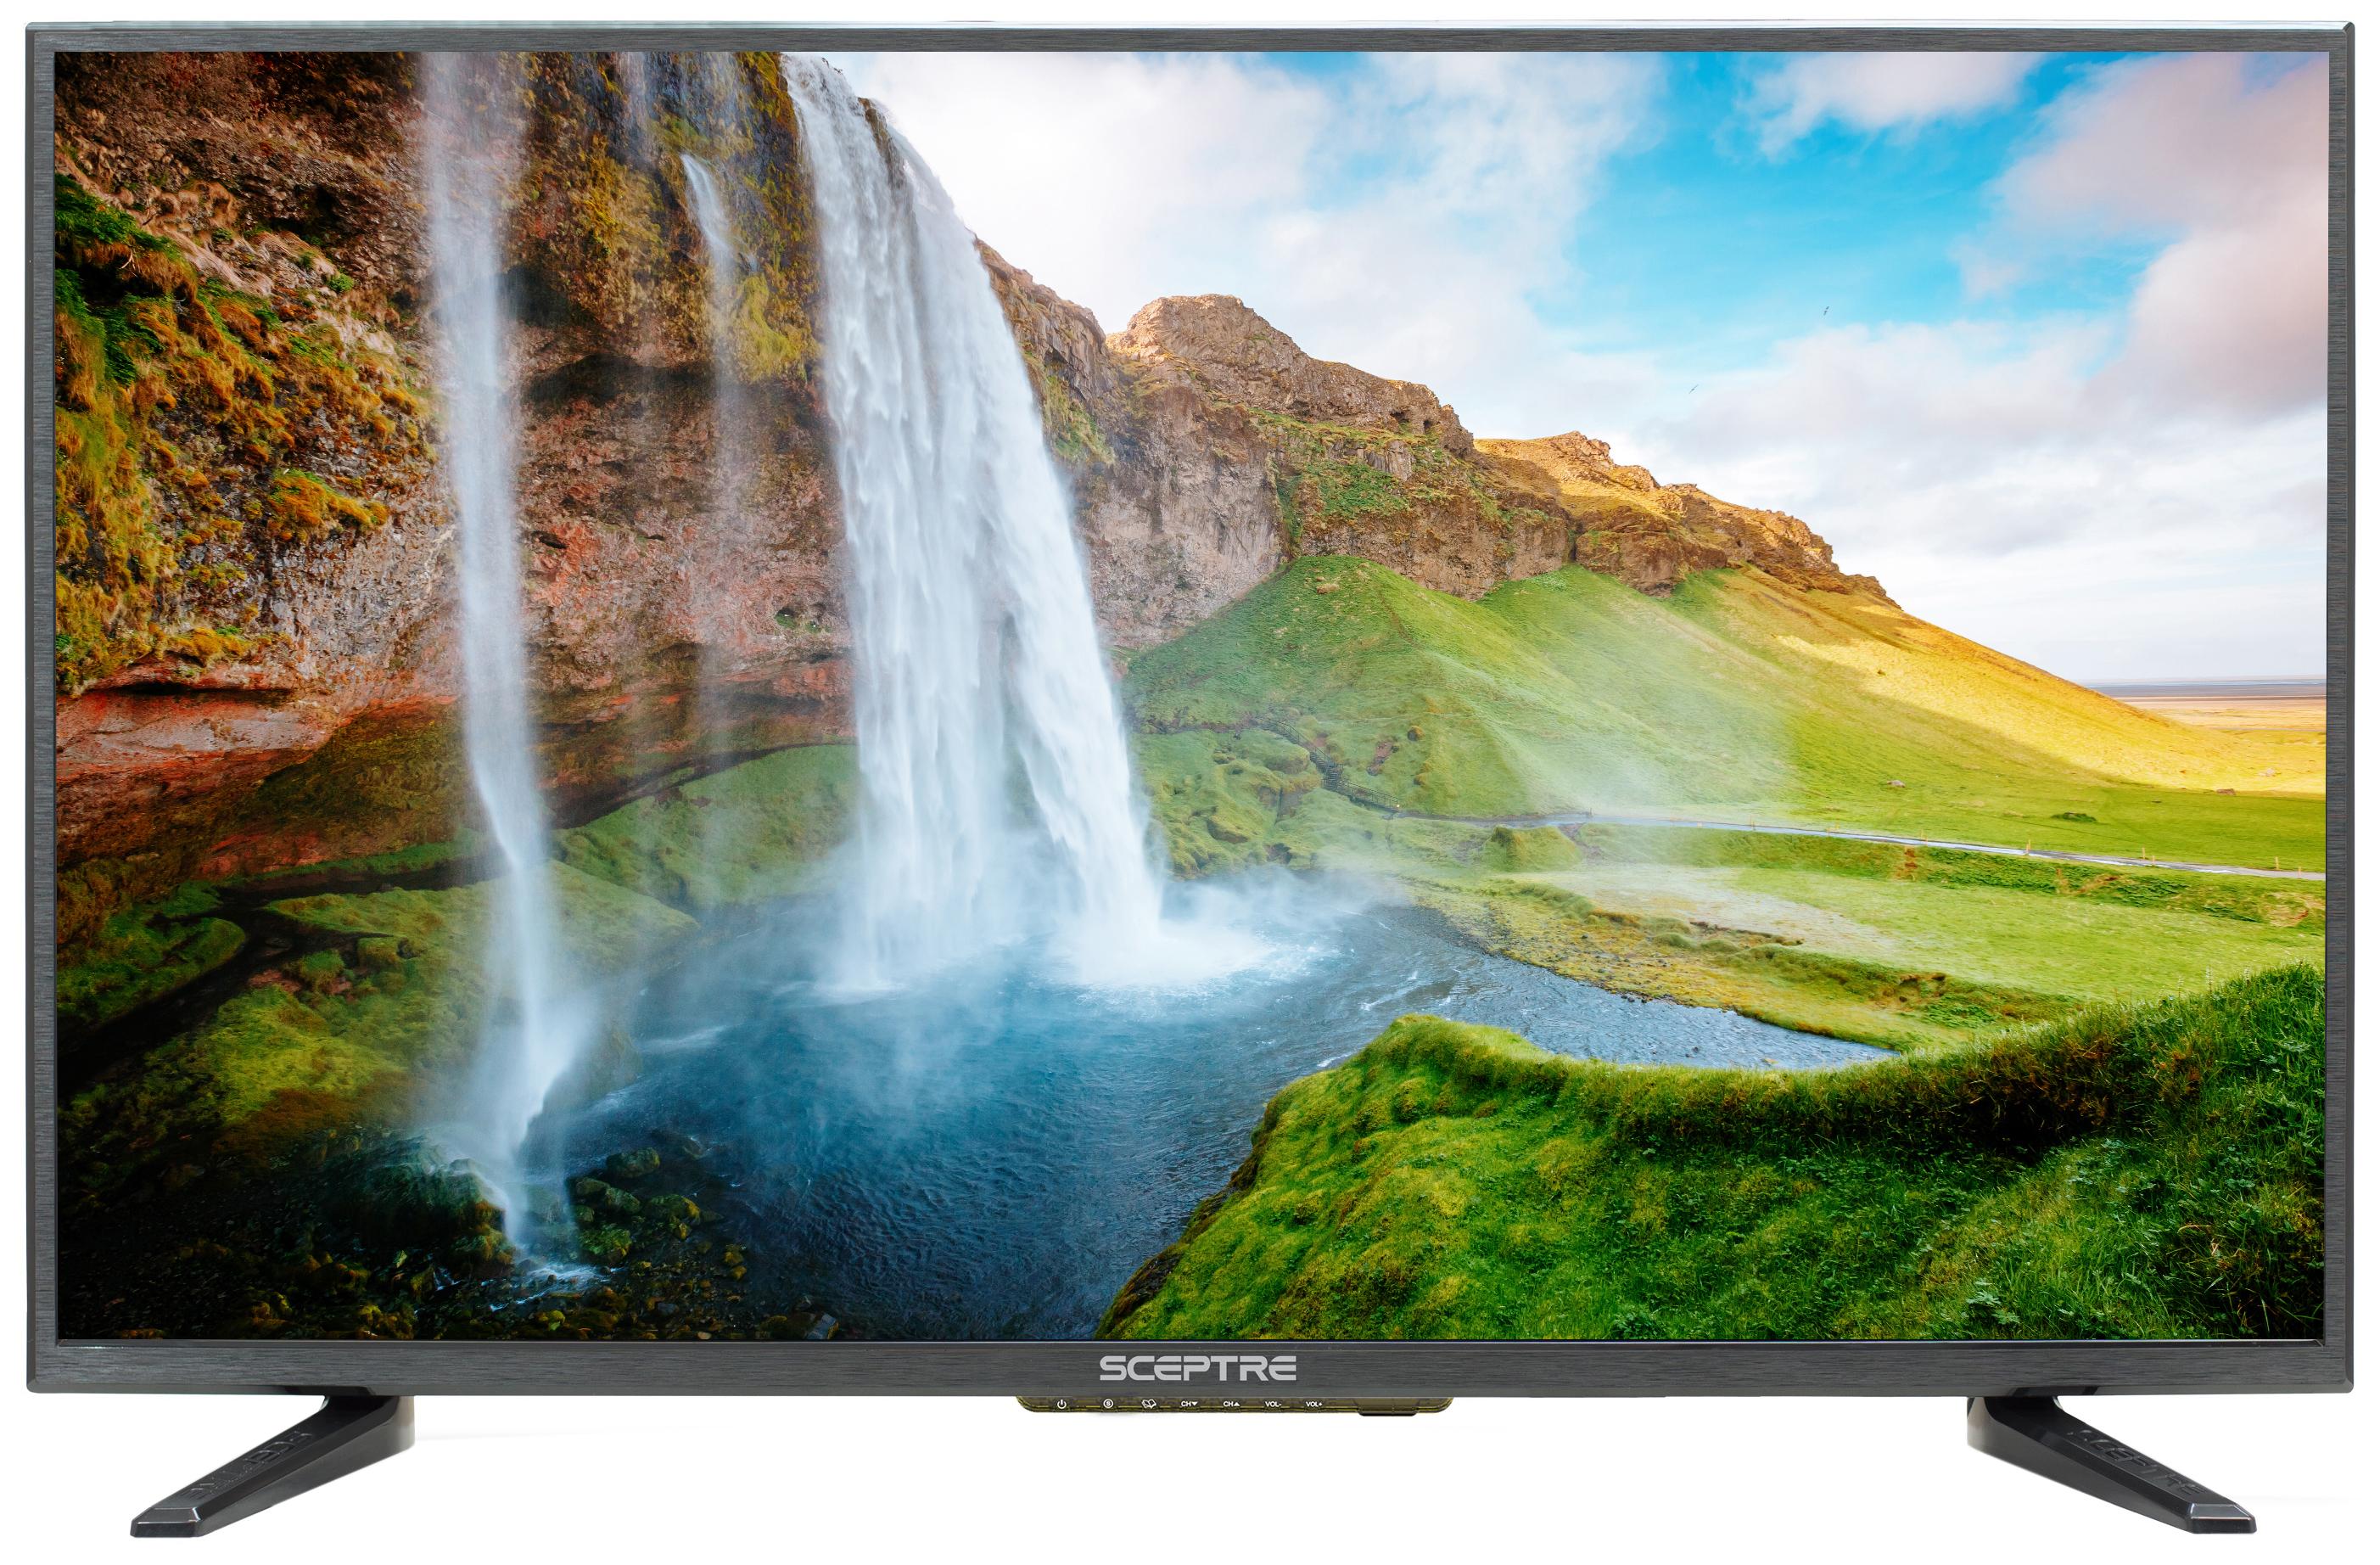 "Sceptre 32"" Class HD (720P) LED TV (X322BV-SR)"